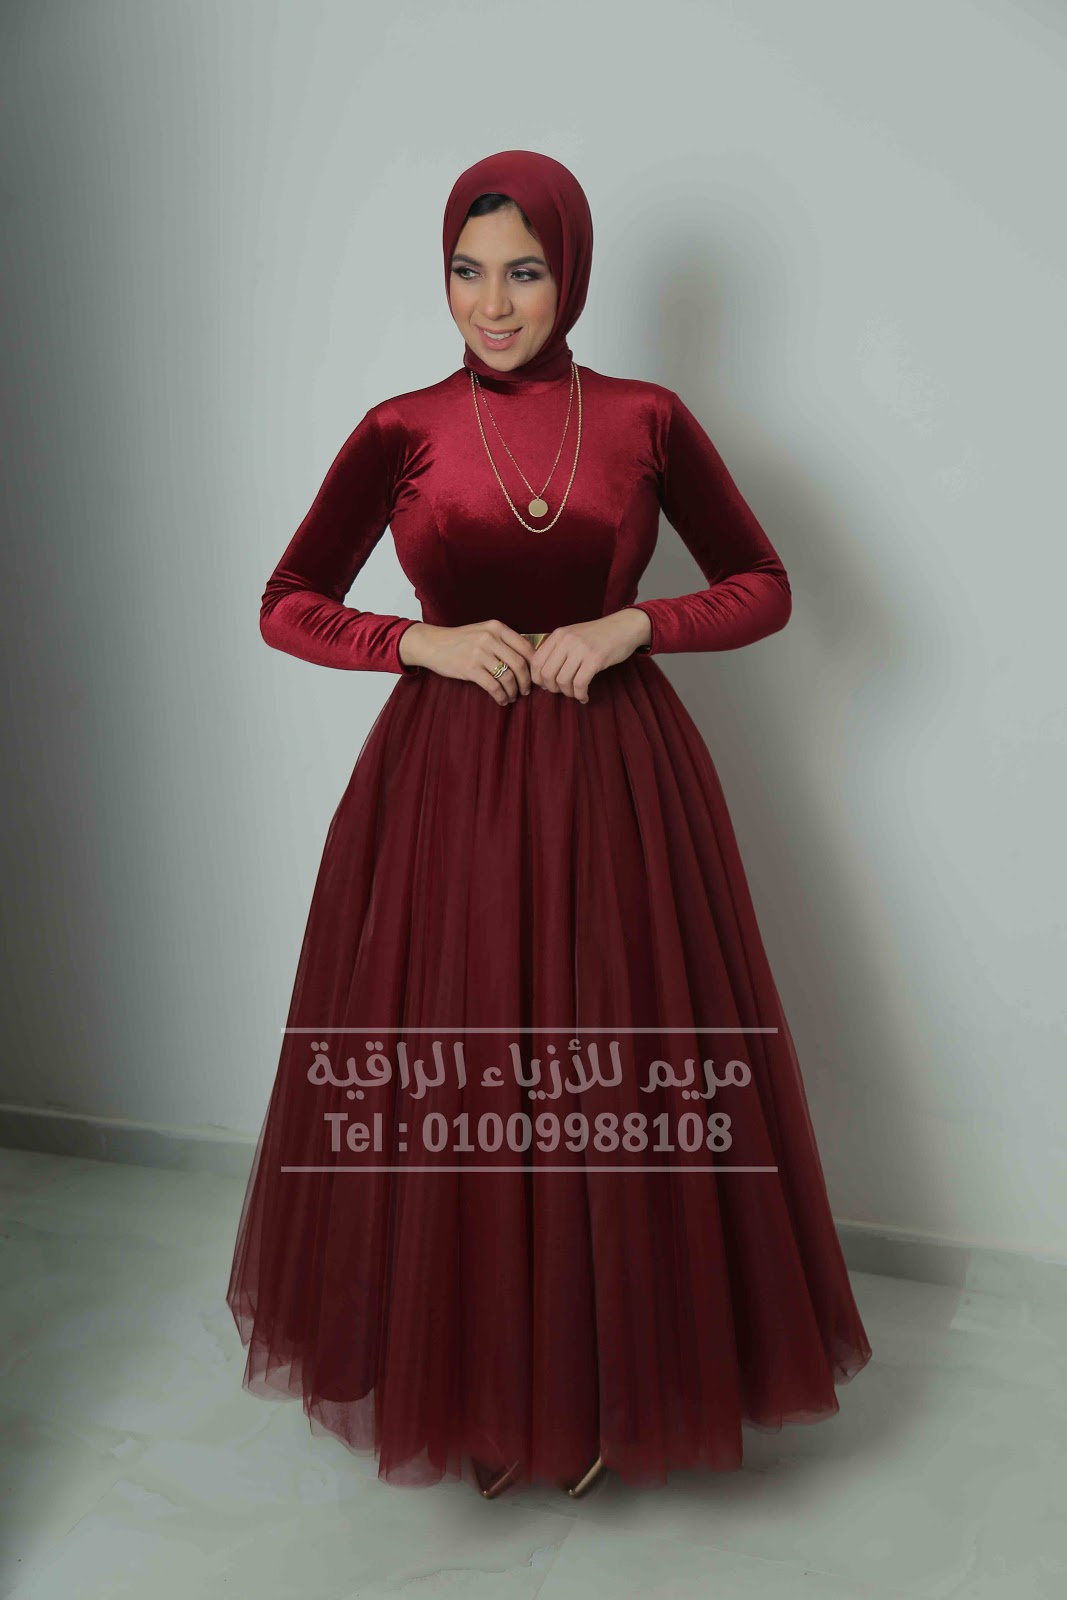 Hijab Soiree Dresses - muslim Dresses